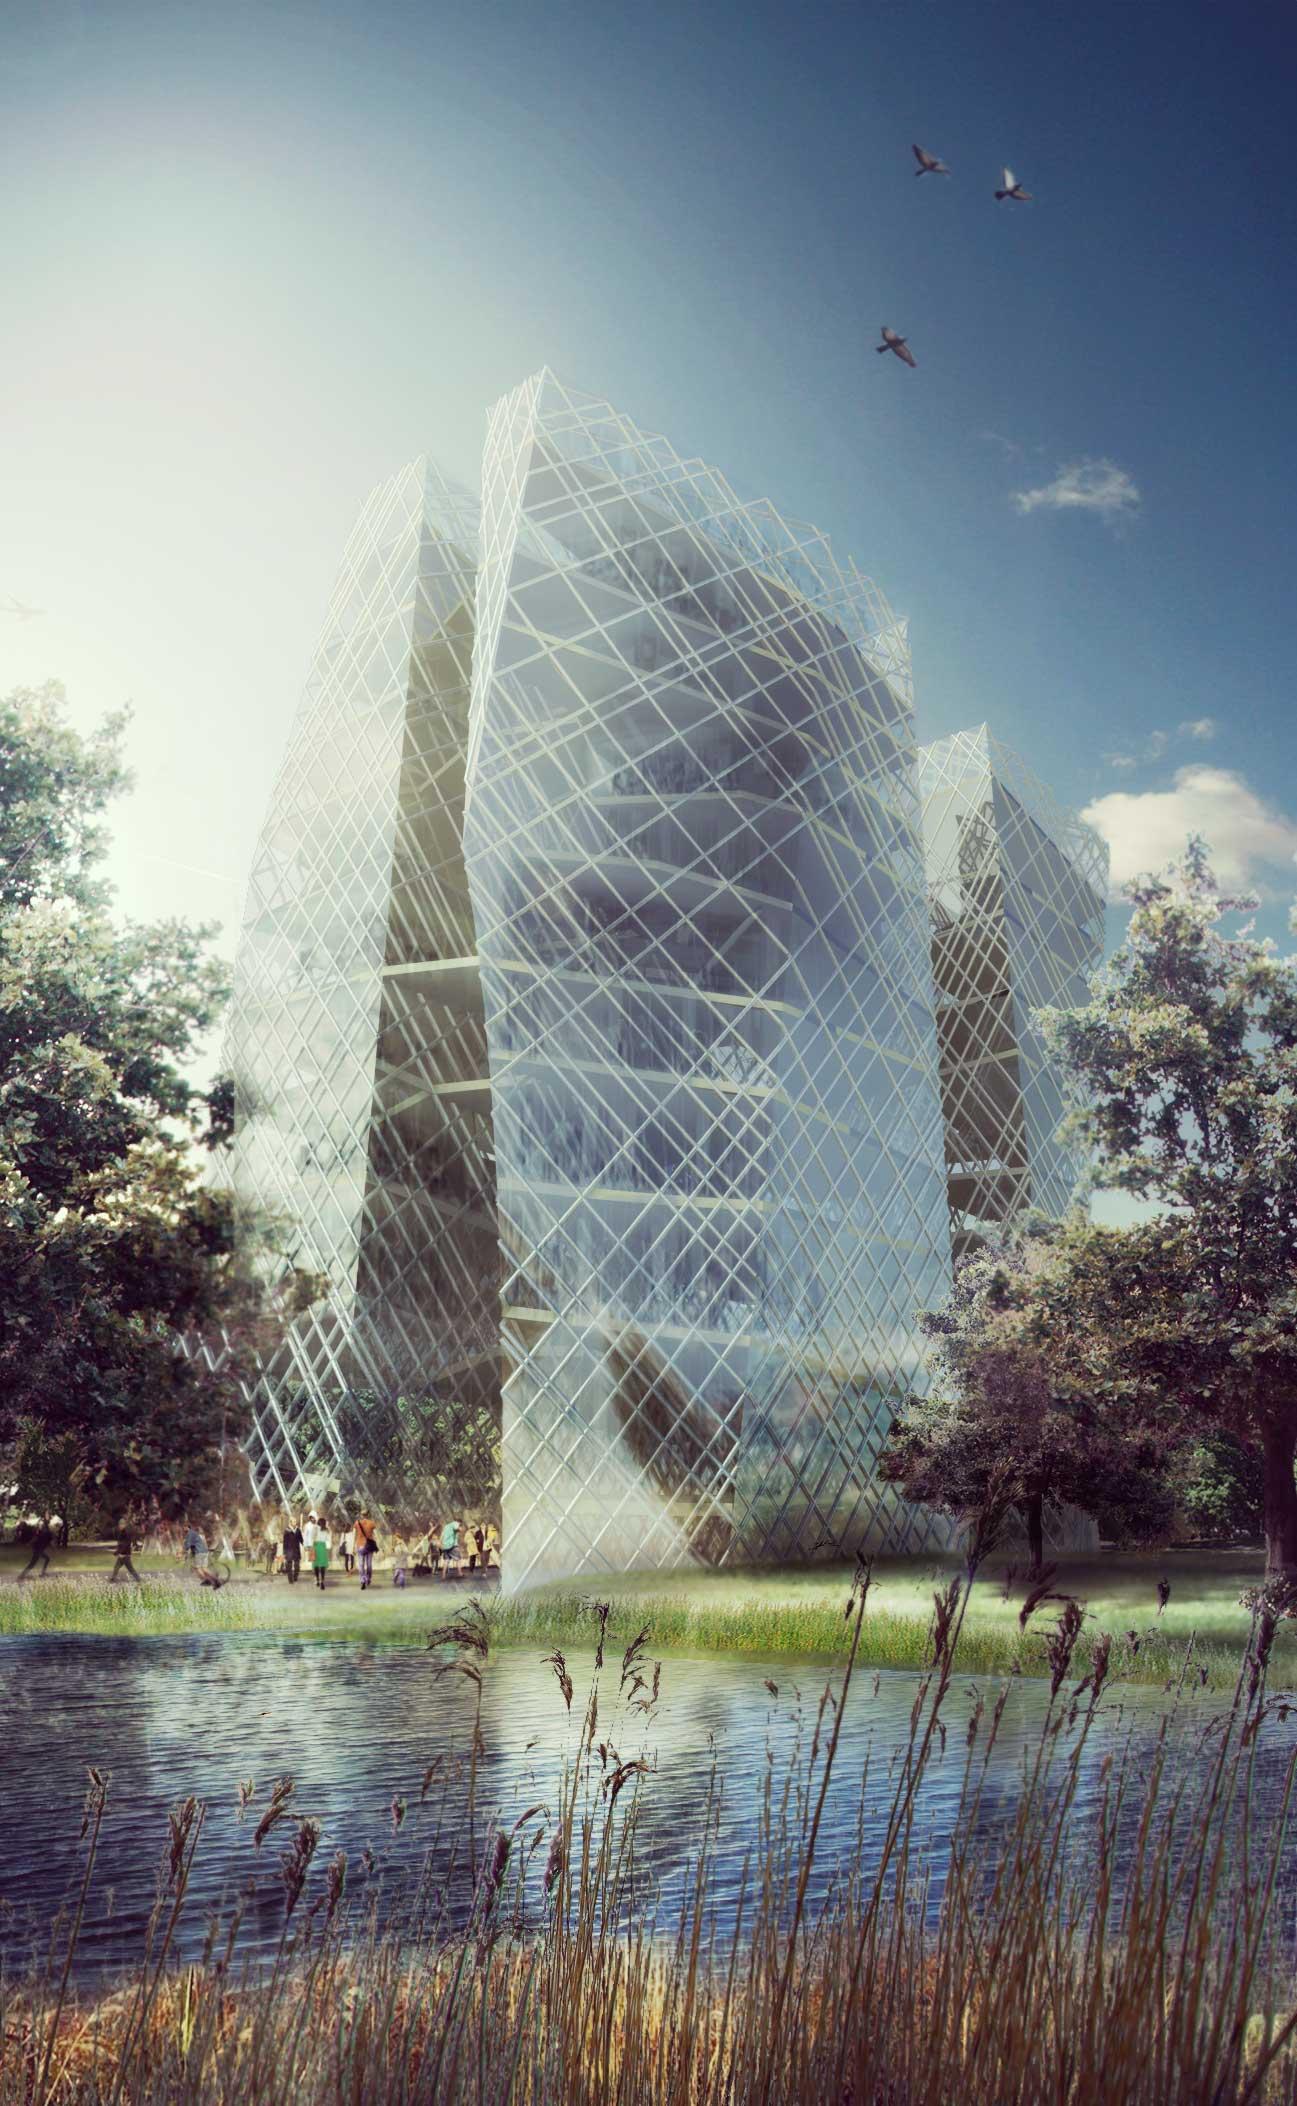 Visualisation, Render, Graphis, Berlin, Inssbruck, Architecture, Faculty of architecture, Austrian architect, Glass, skyscraper, Park